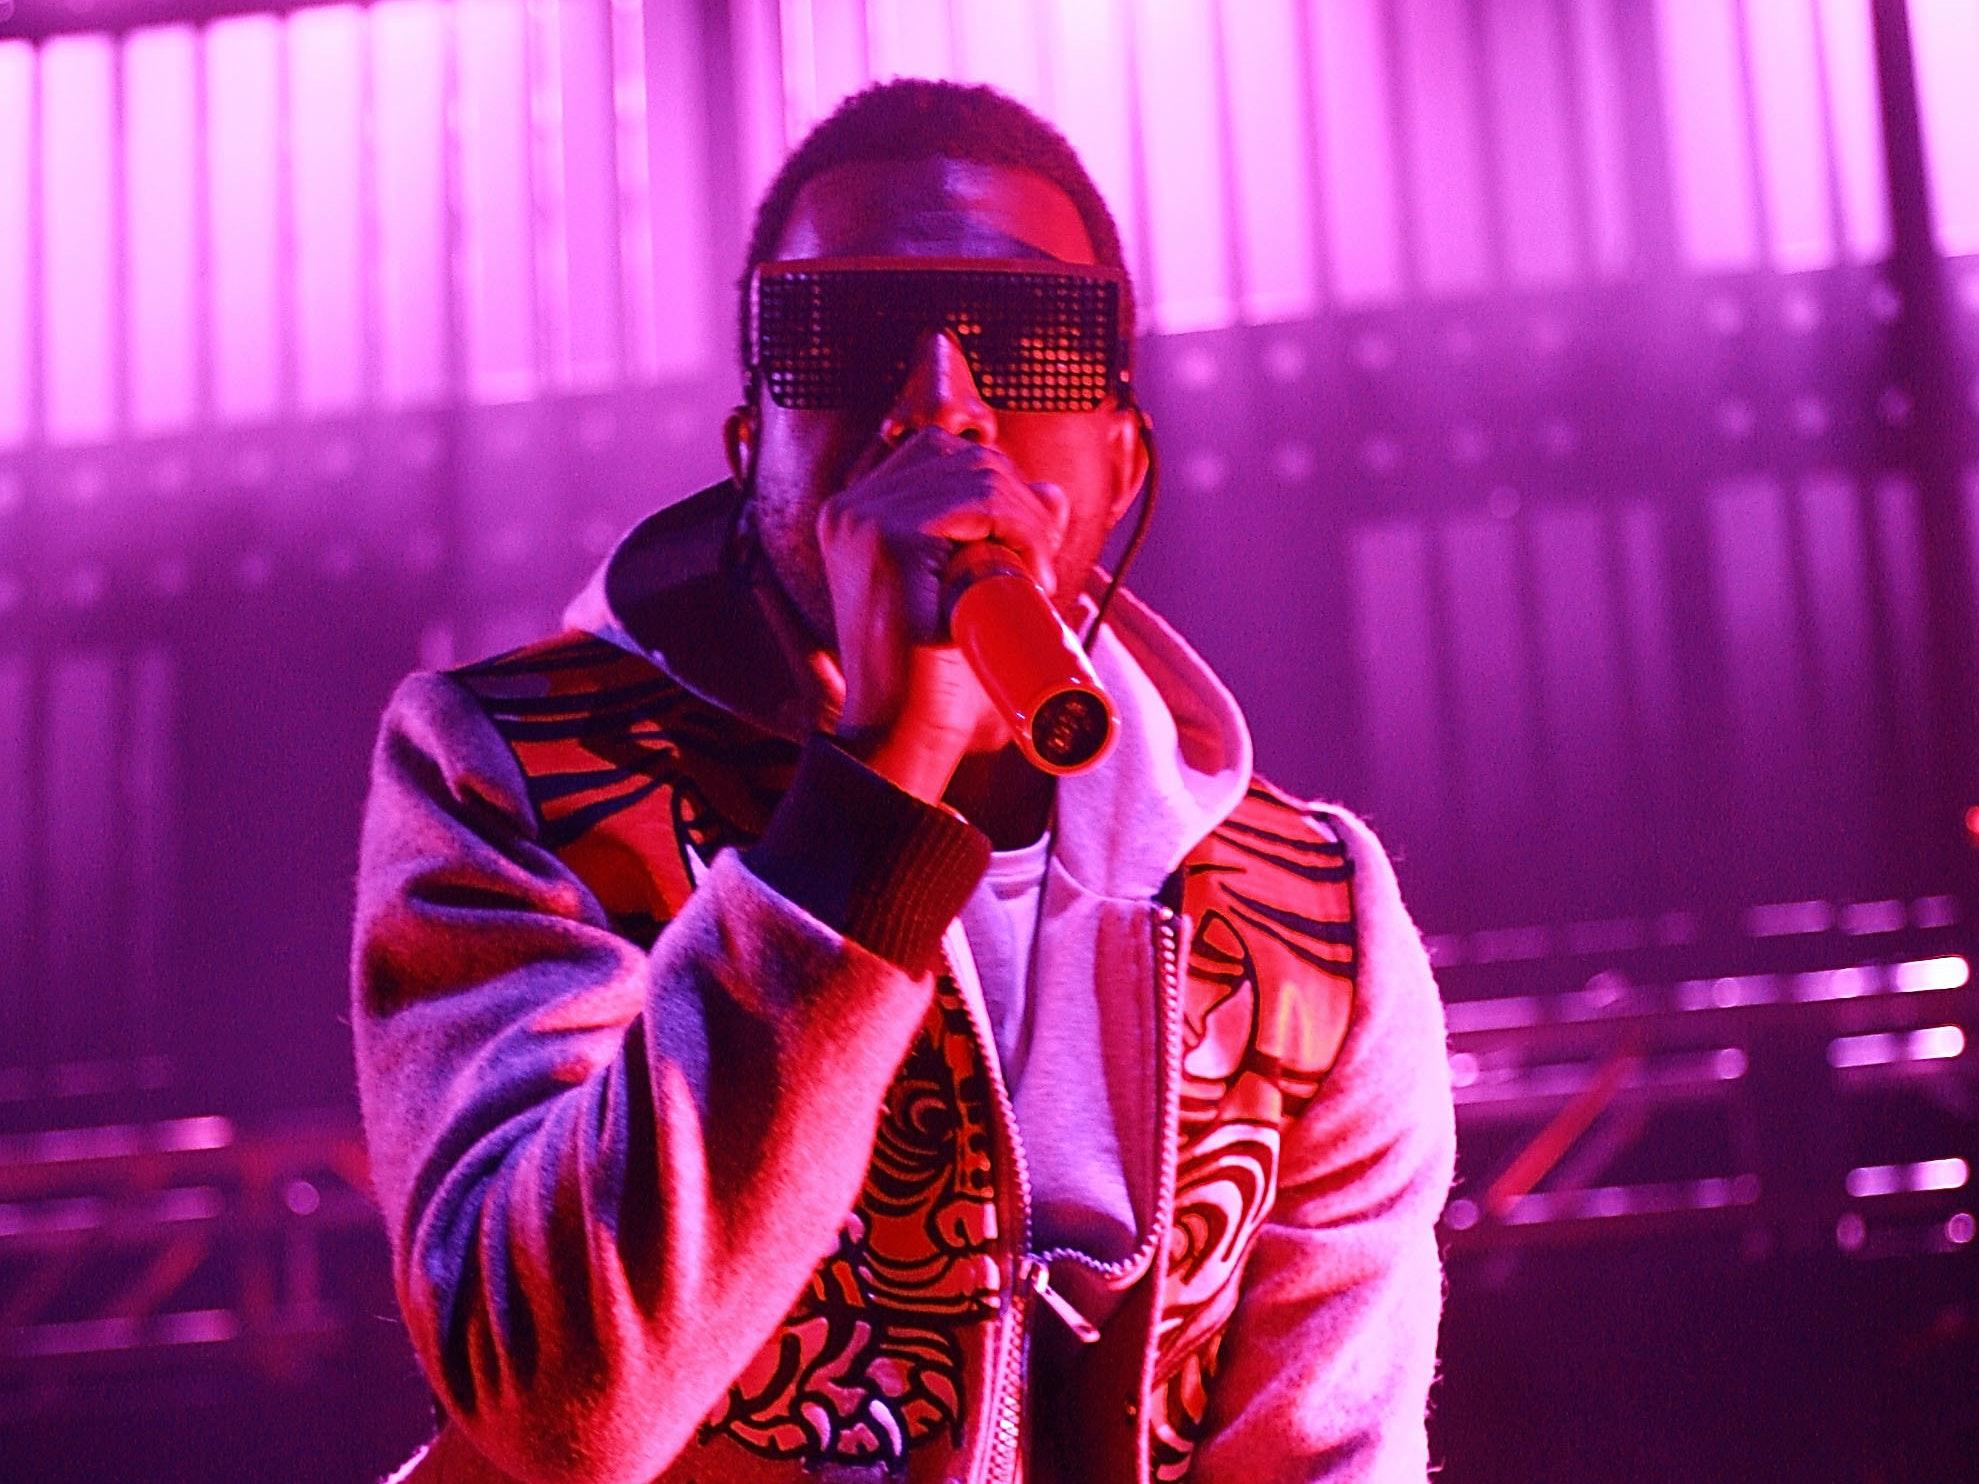 "Kanye West's '808s & Heartbreak:"" A Weird Fluke That Changed Pop Music"